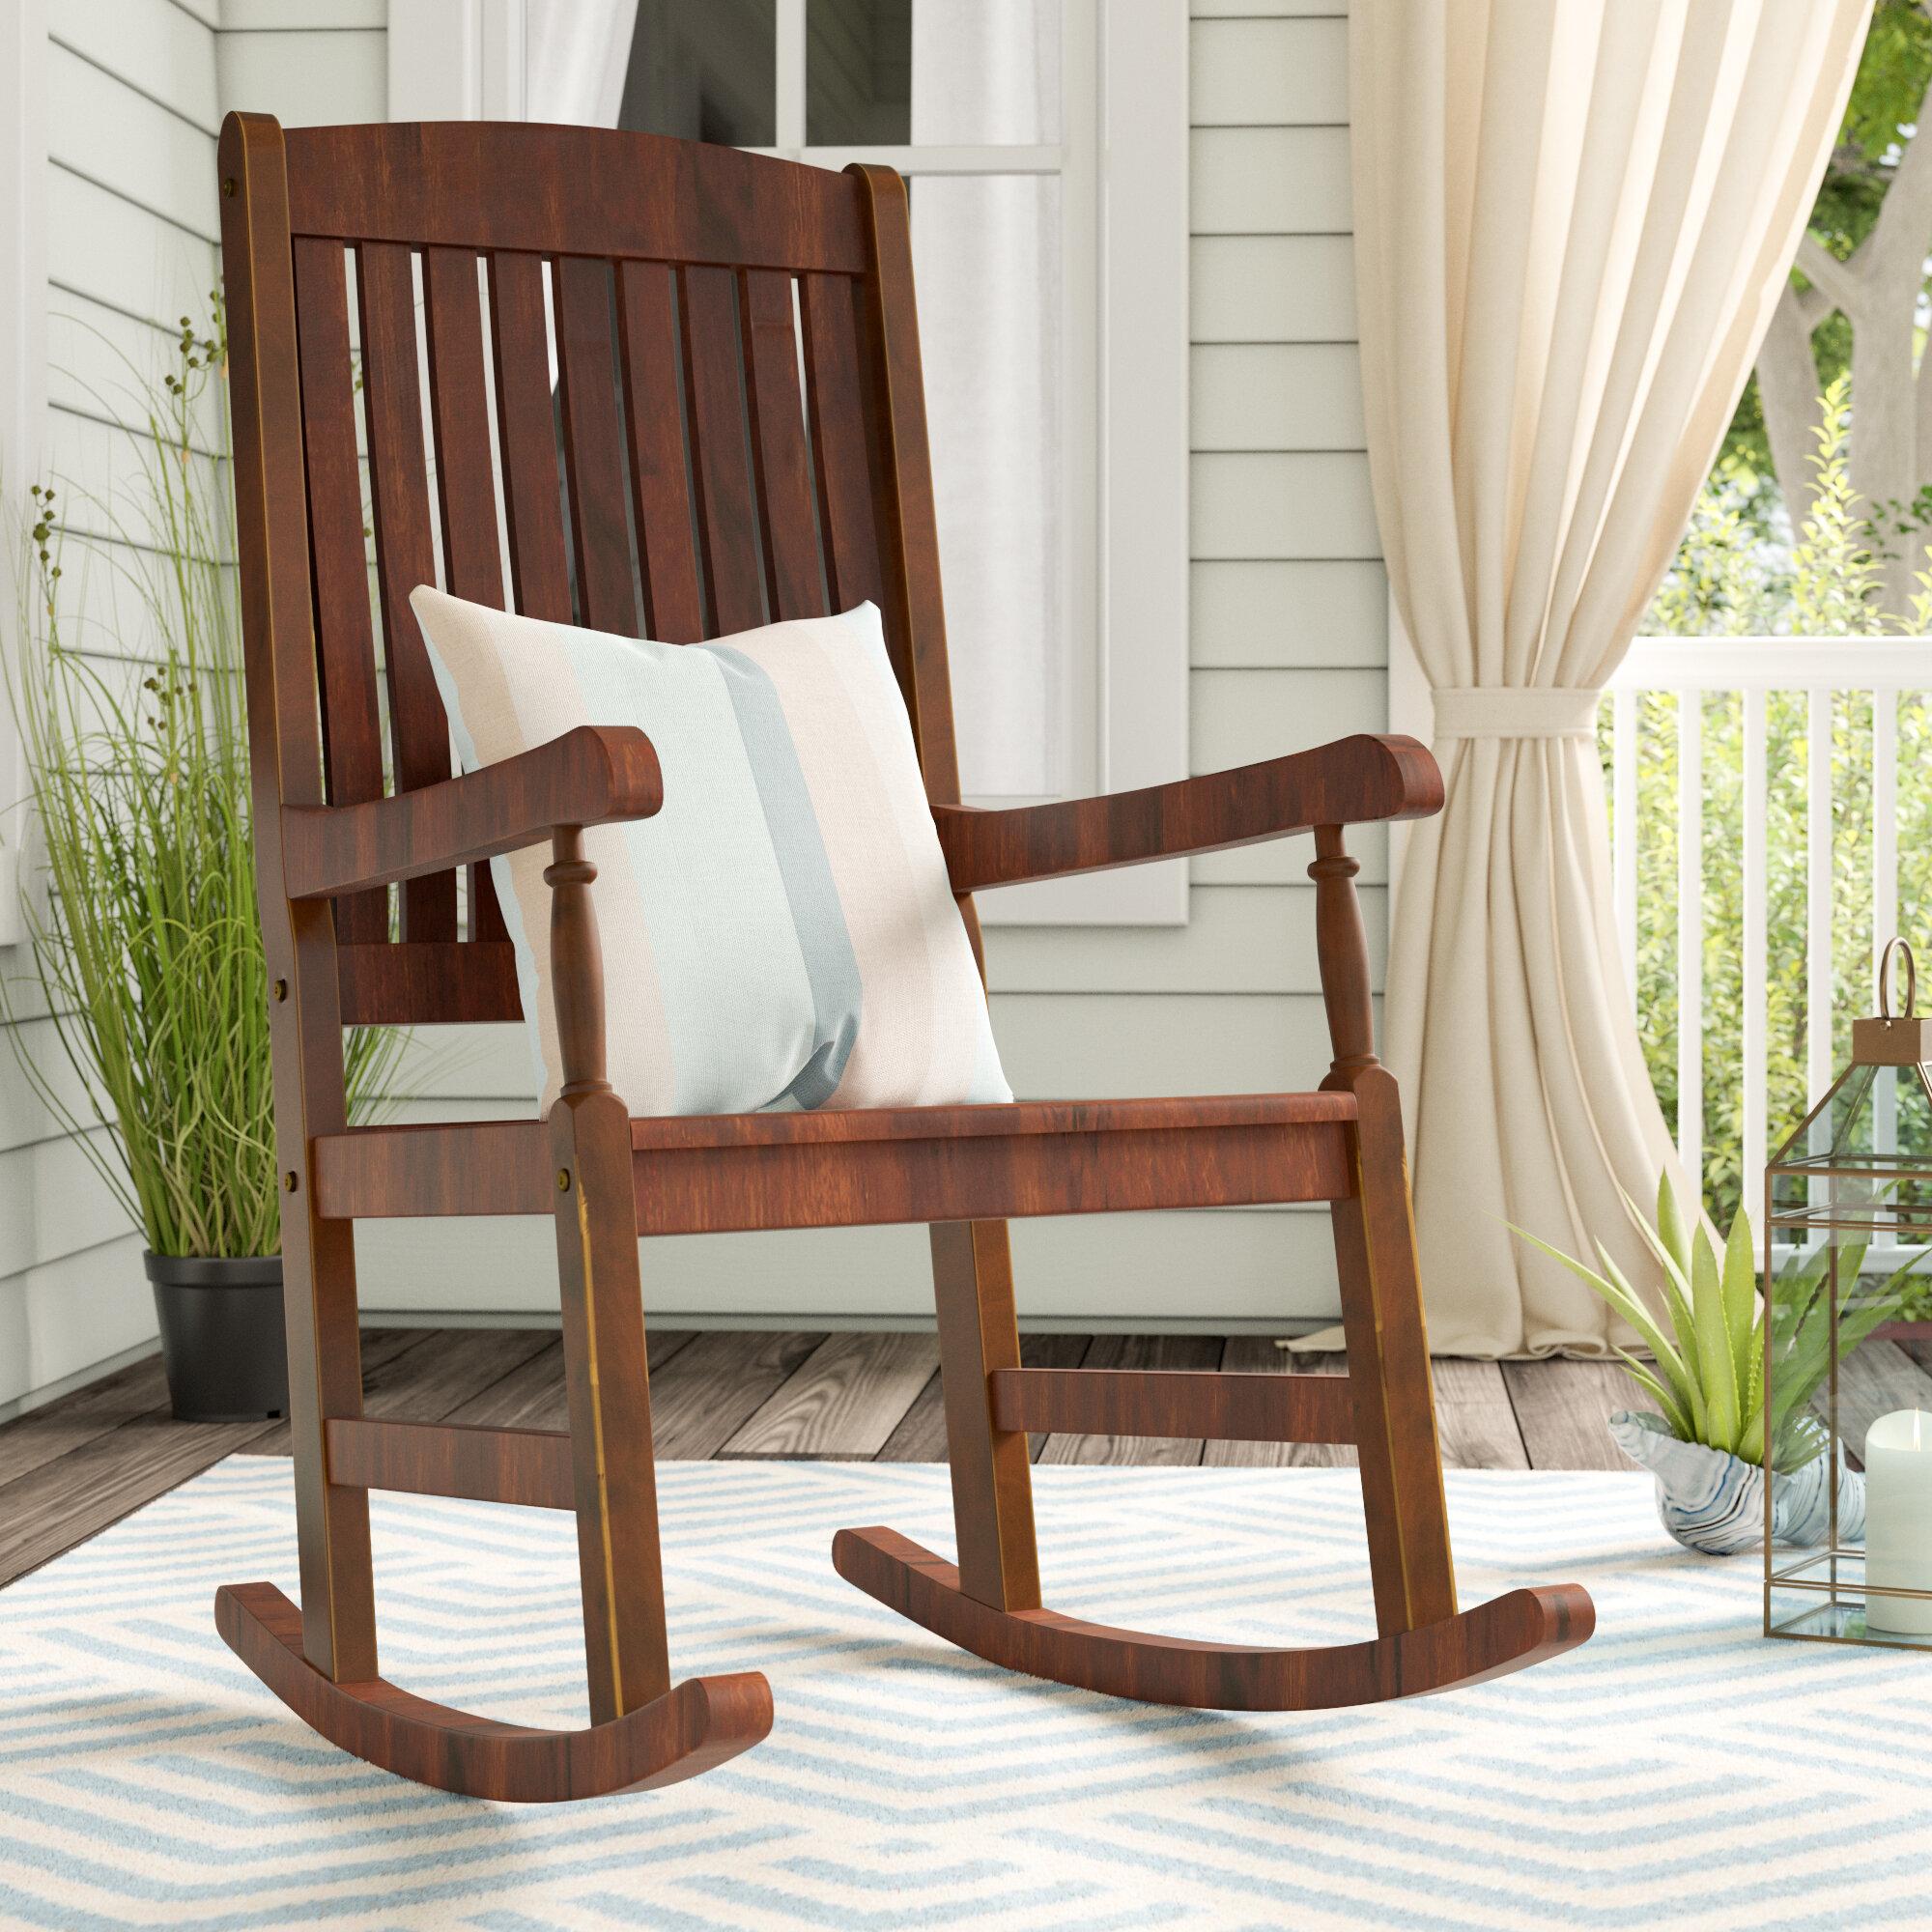 Miraculous Rothstein Rocking Chair Beatyapartments Chair Design Images Beatyapartmentscom